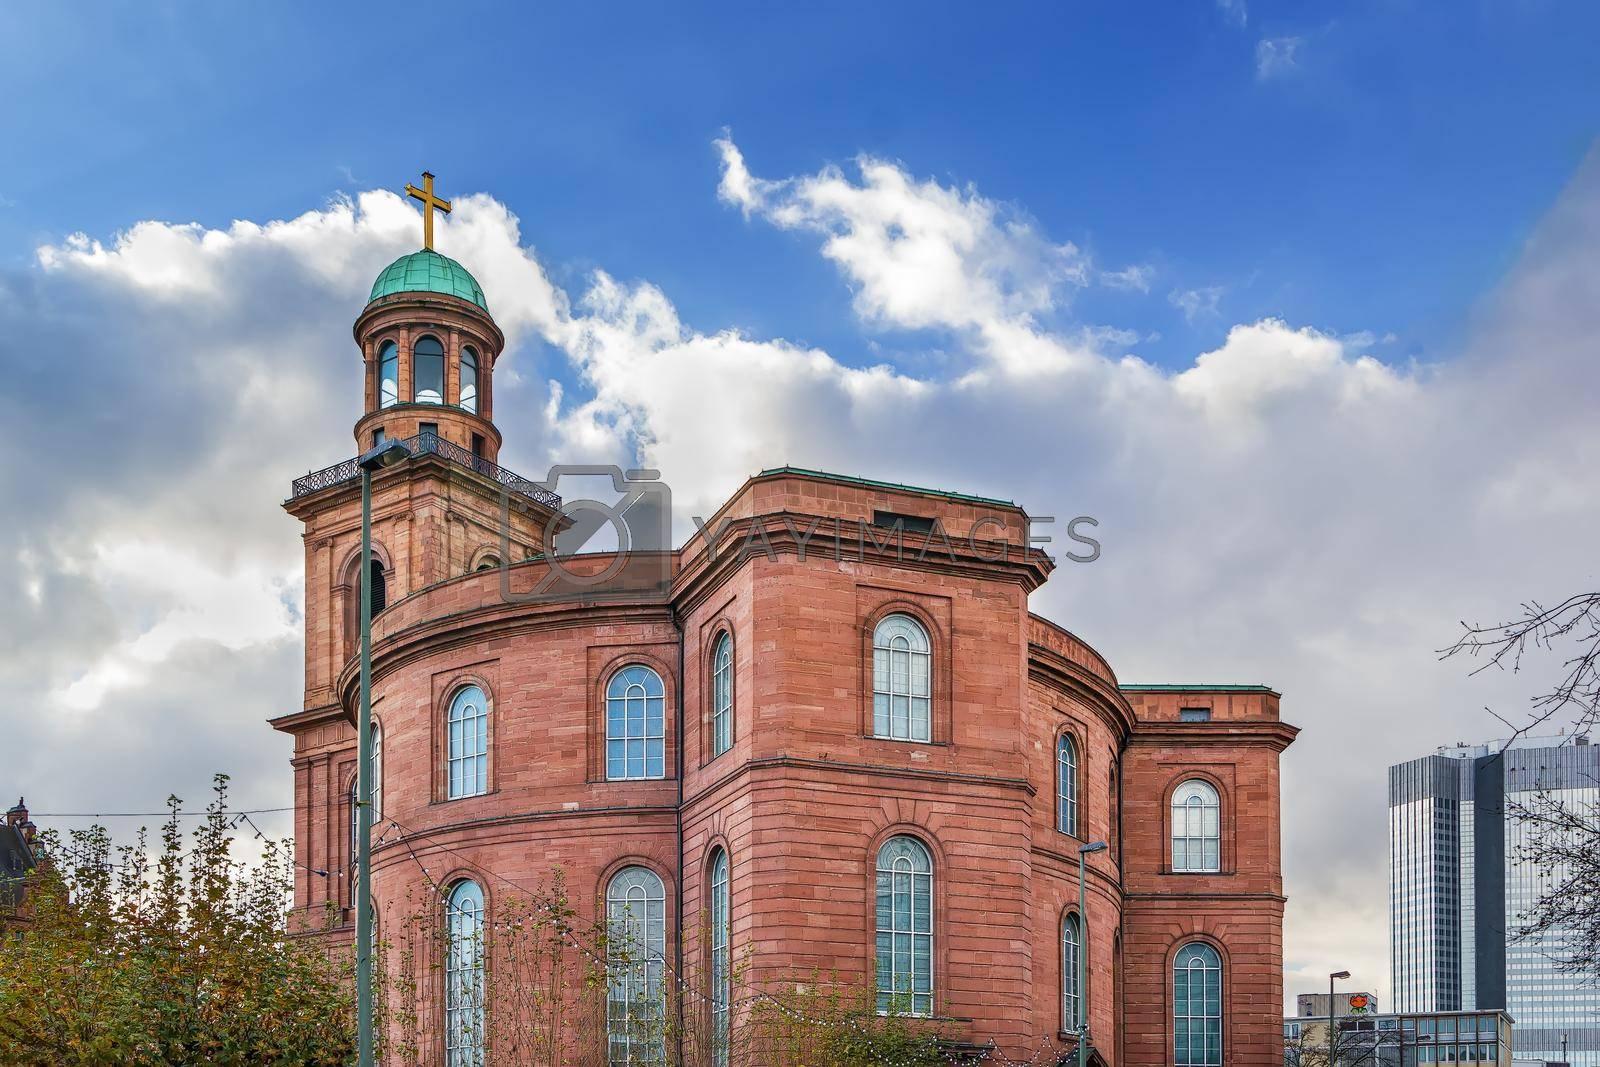 Royalty free image of St. Paul's Church, Frankfurt am Main, Germany by borisb17